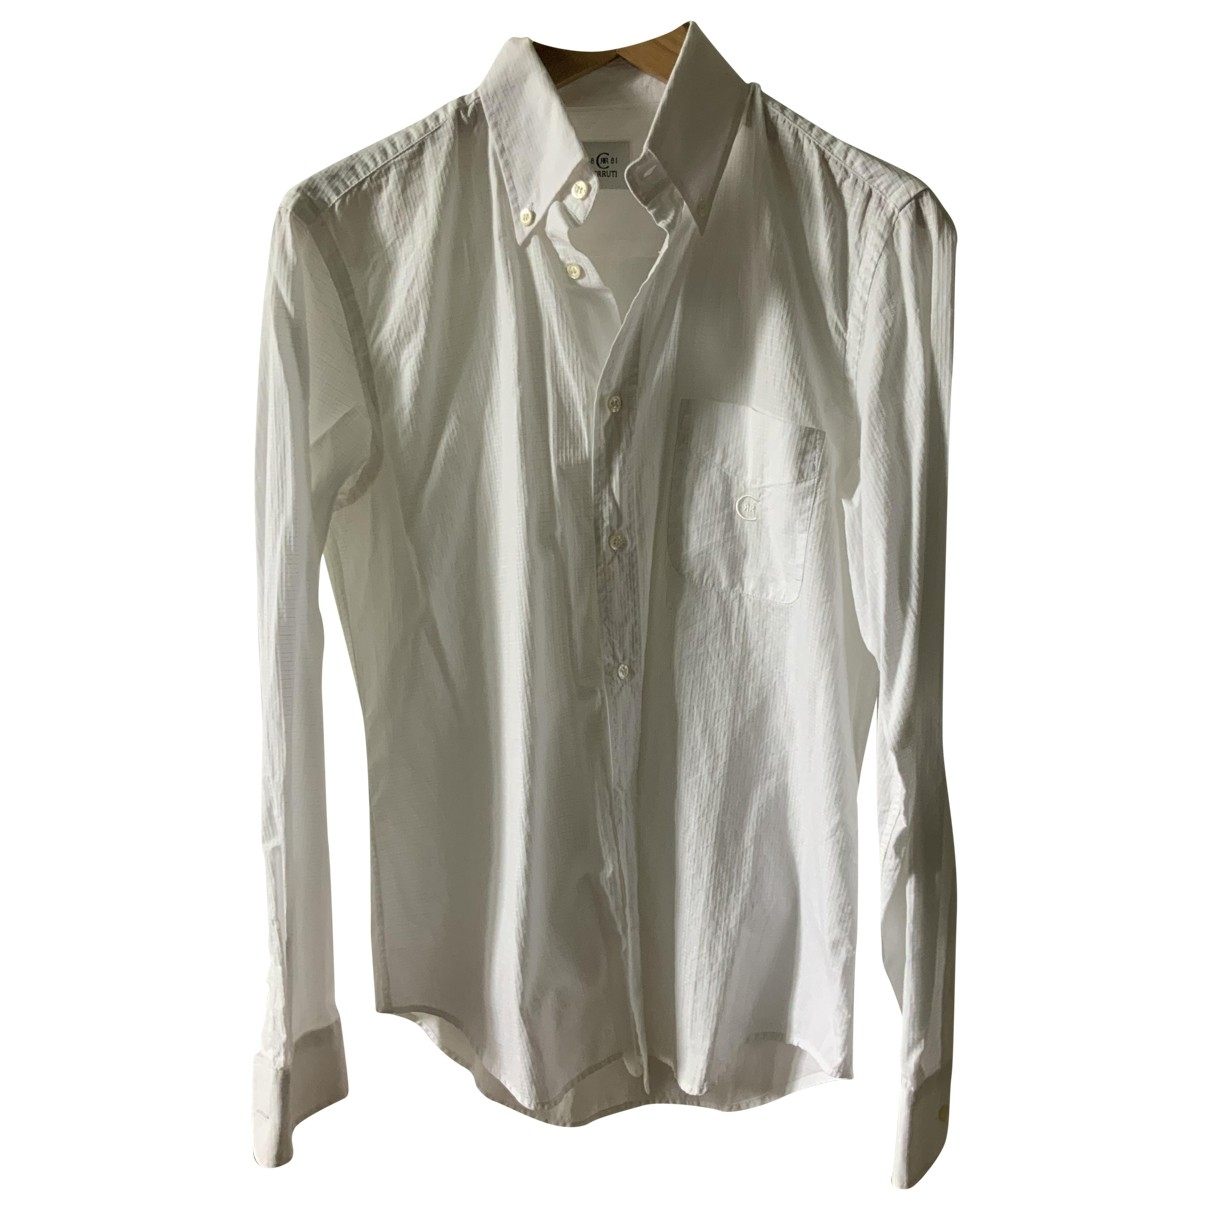 Cerruti \N White Cotton Shirts for Men S International